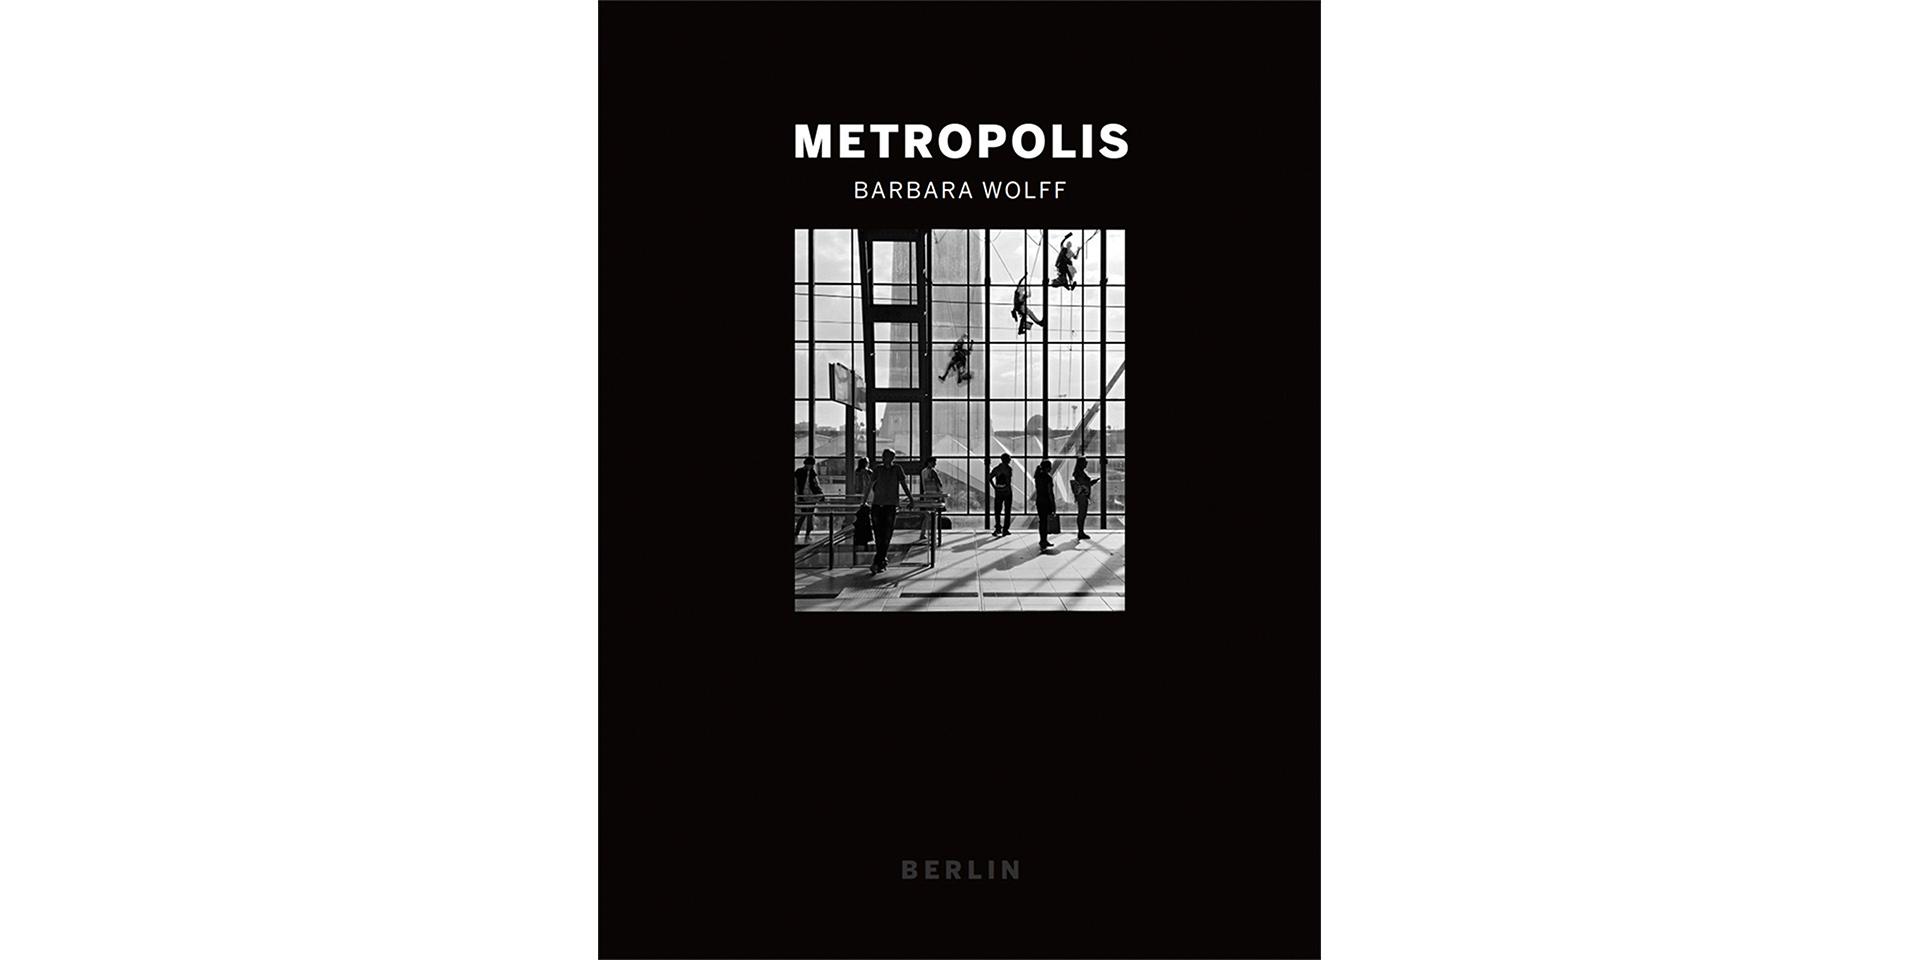 Metropolis, Berlin